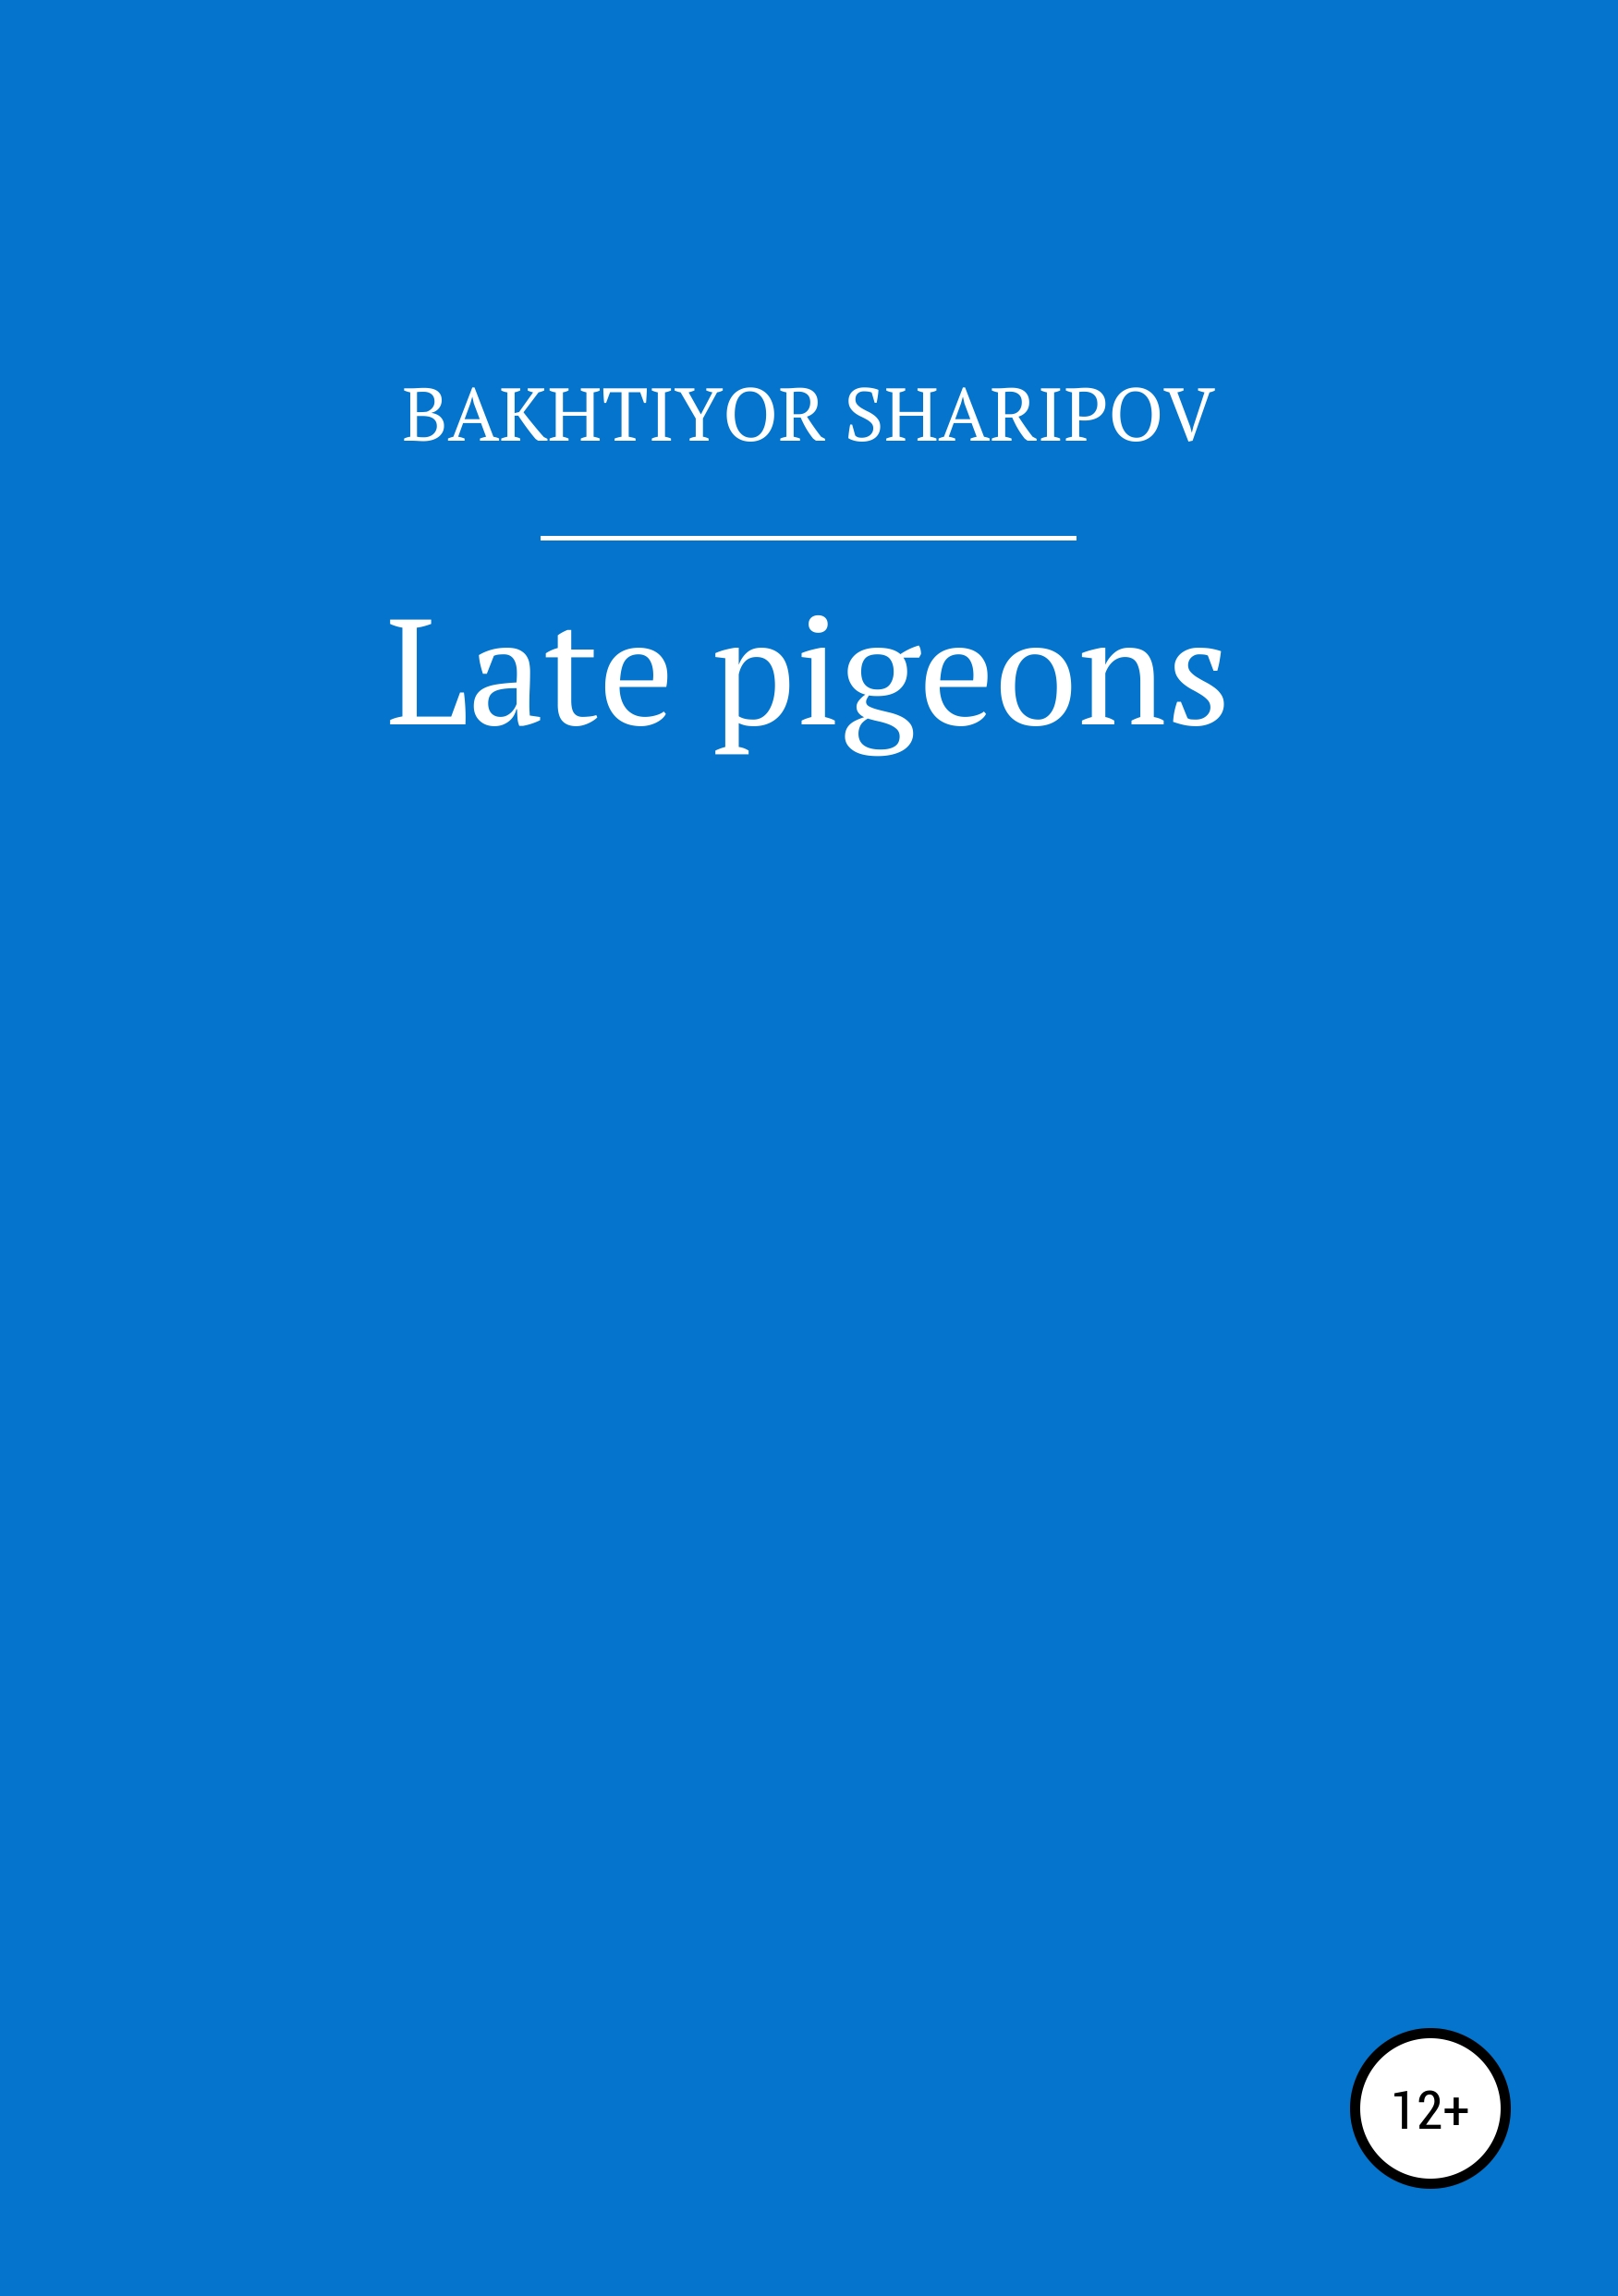 Late pigeons